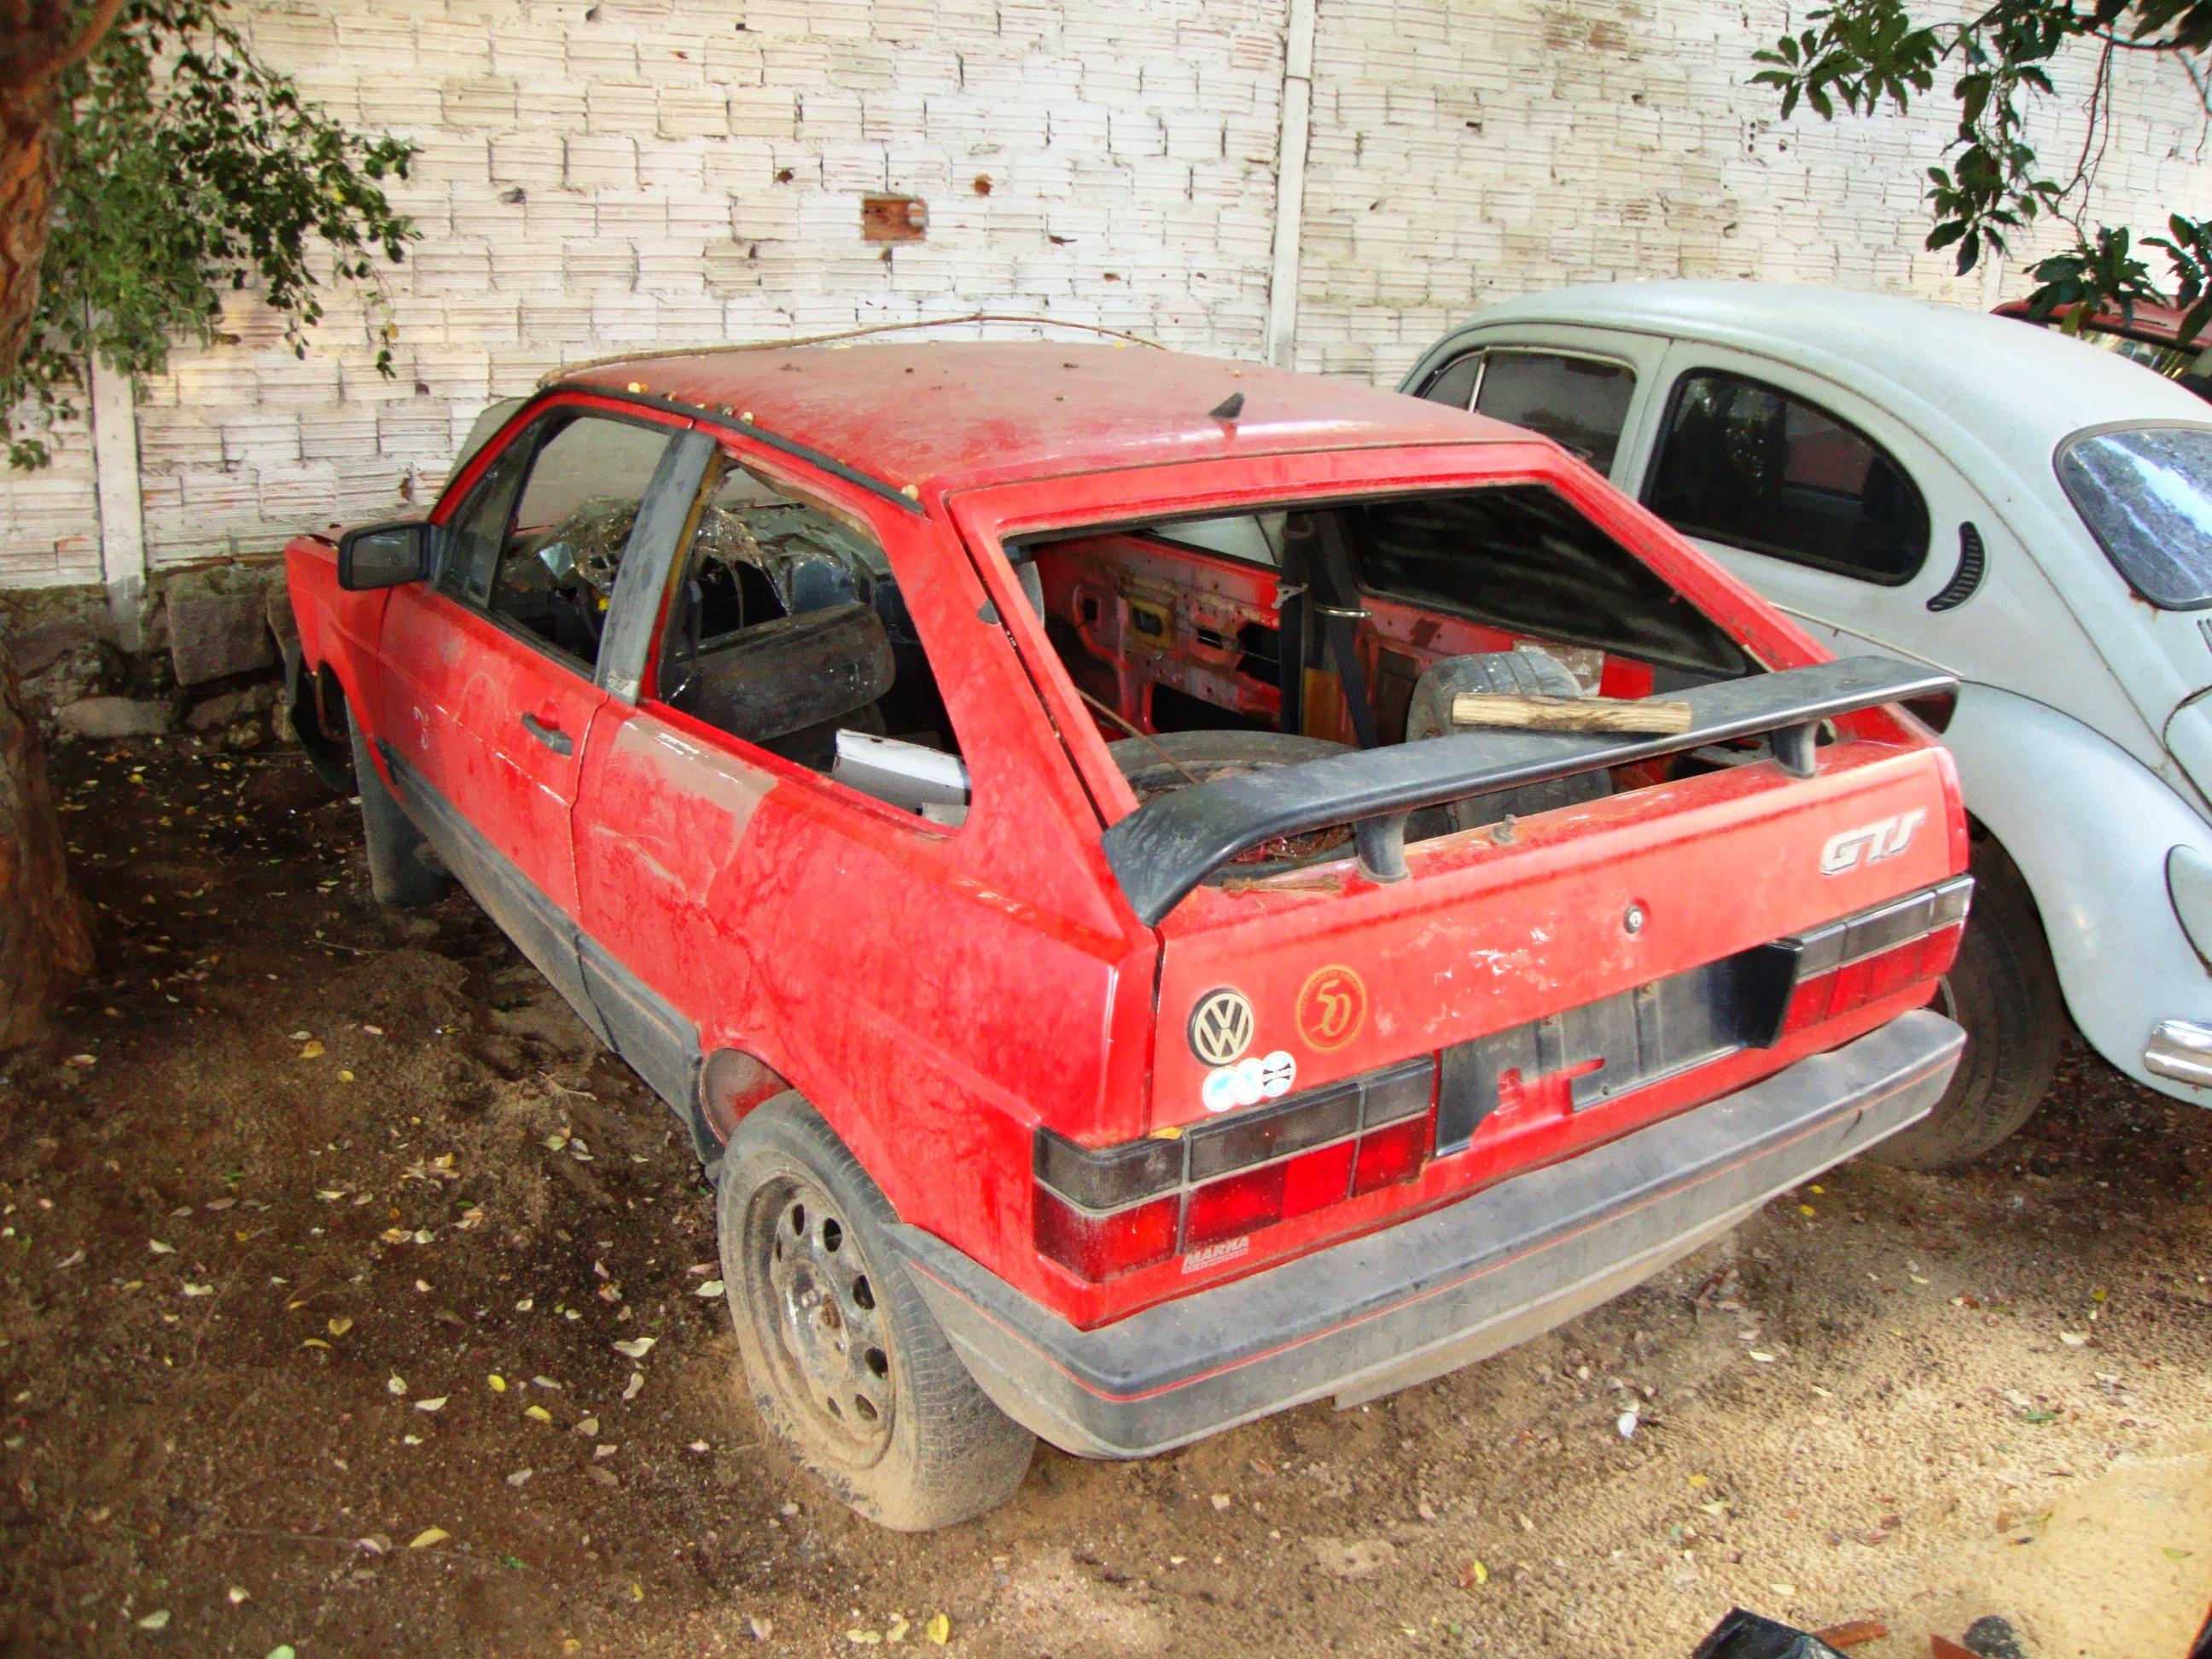 umarcelokt-poa-gol-gts Volkswagen Gol